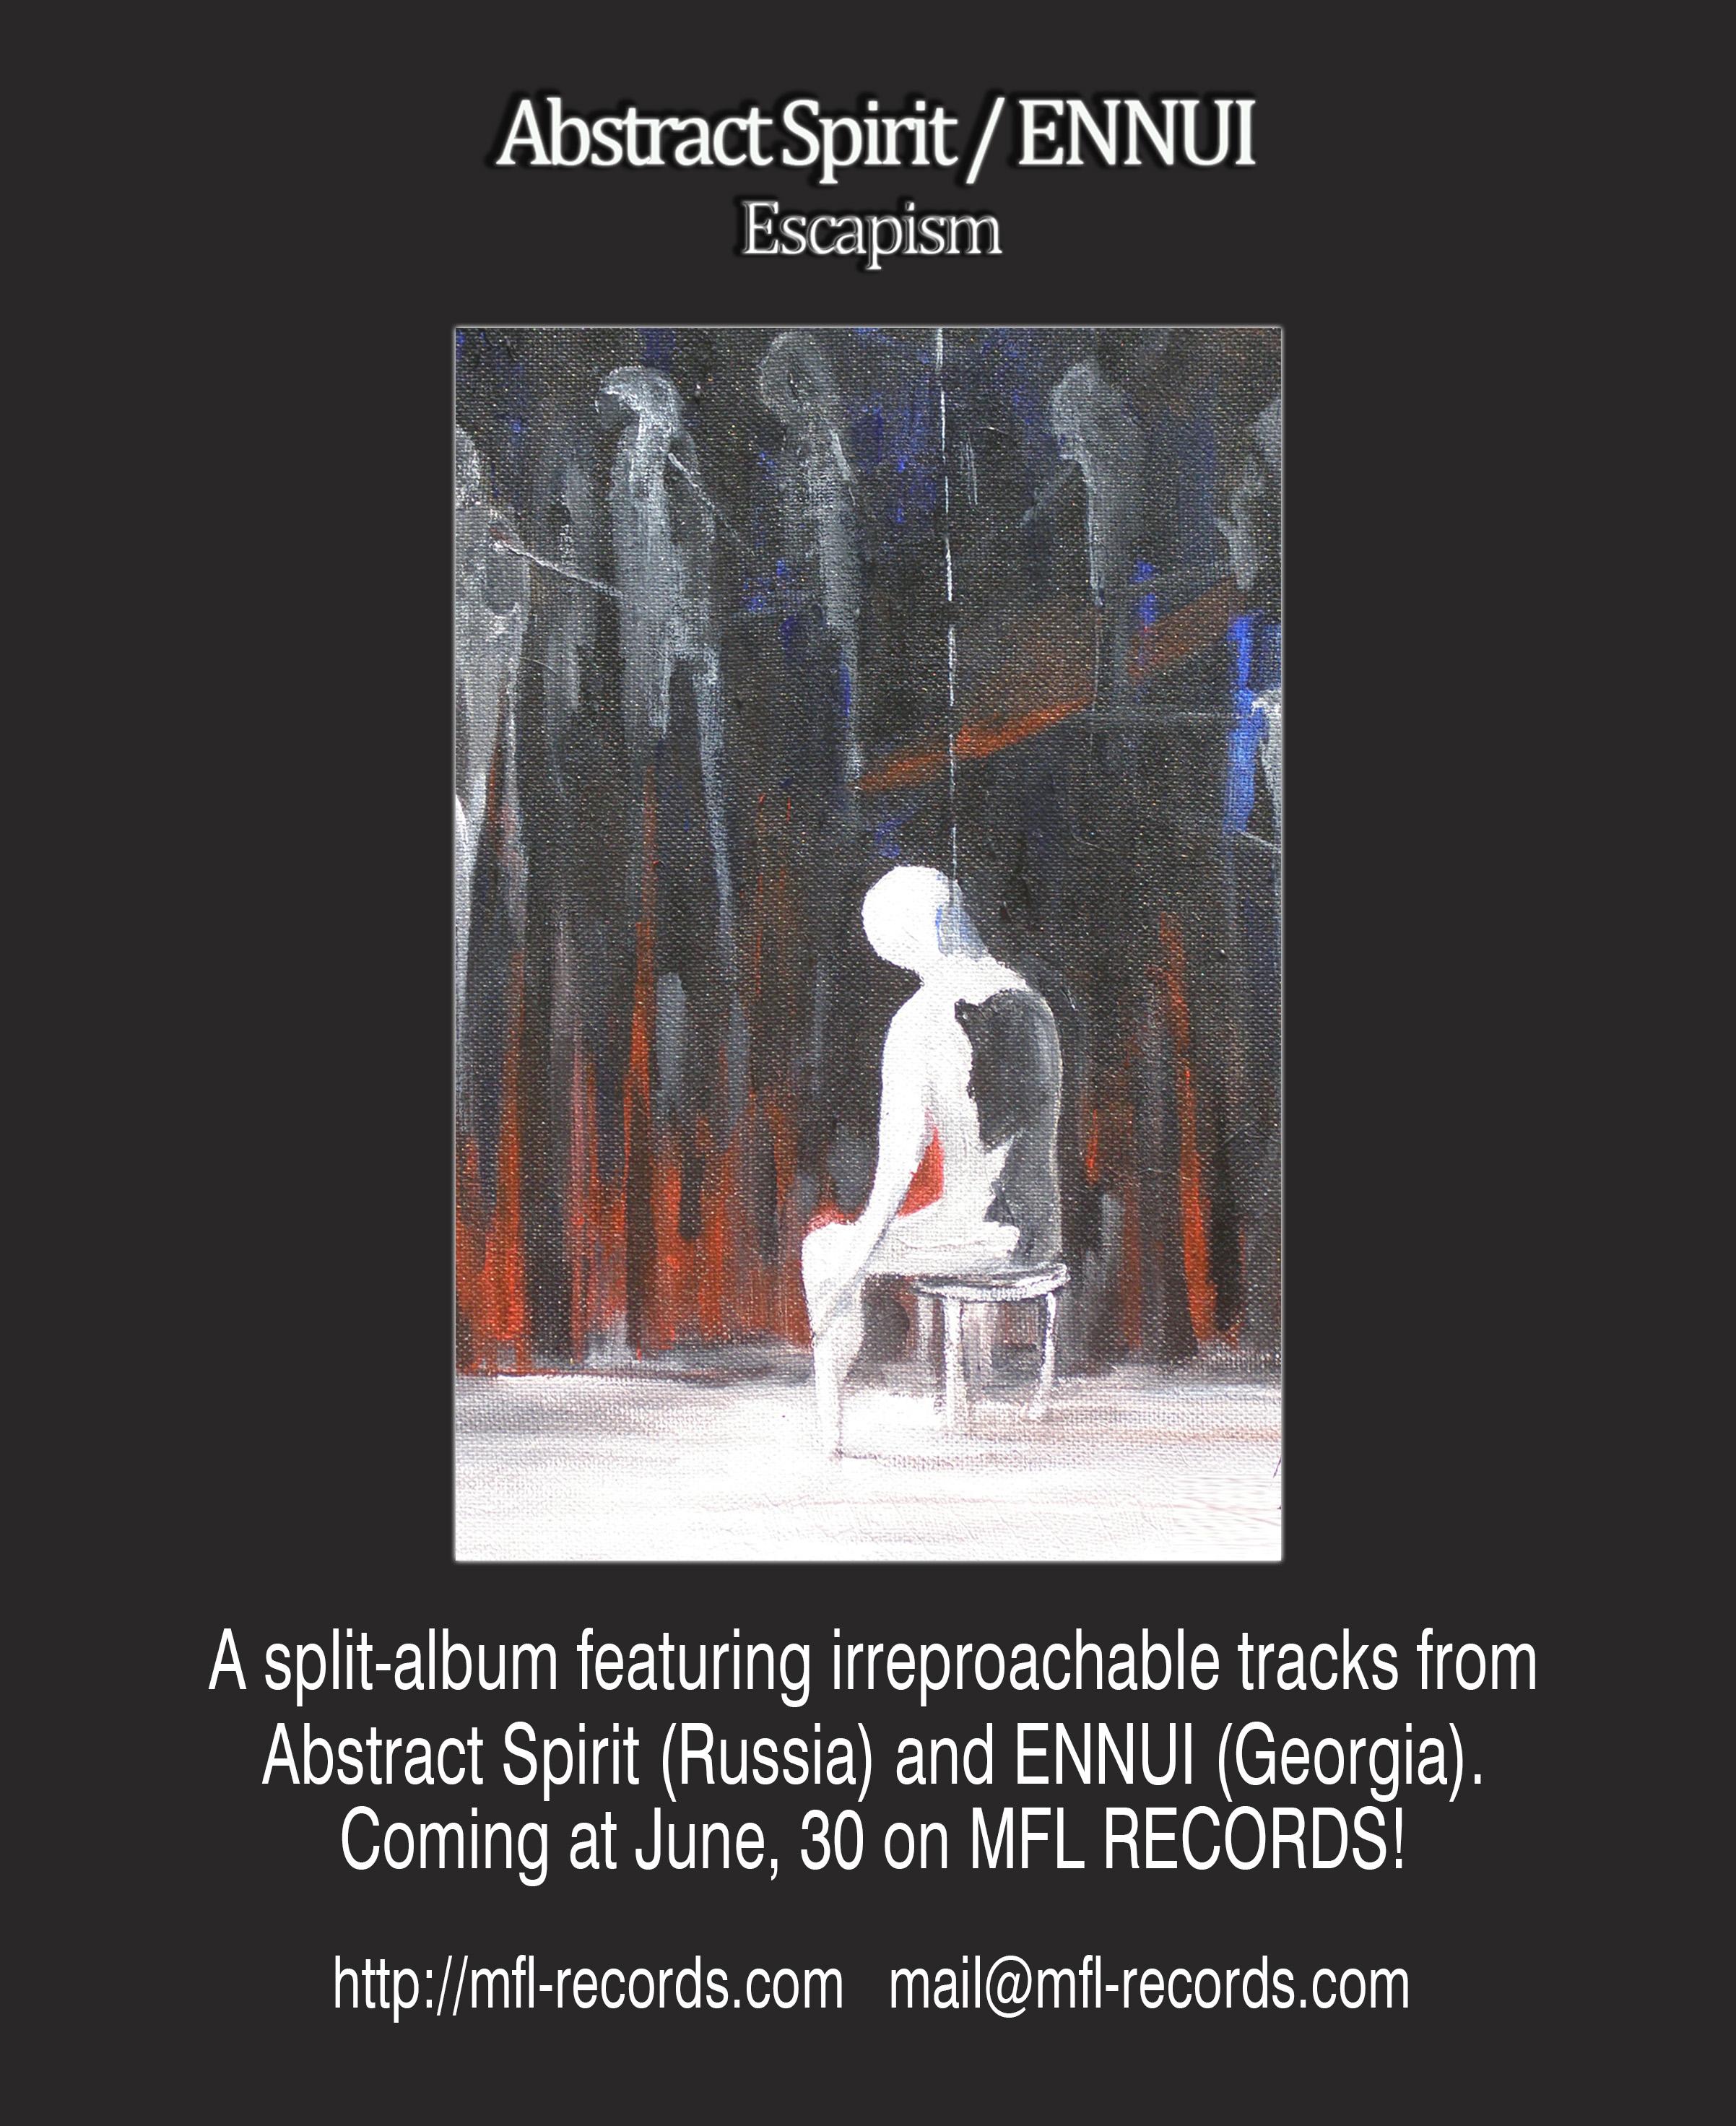 Abstract Spirit - ENNUI_upcoming split album on MFL-Records_announcement